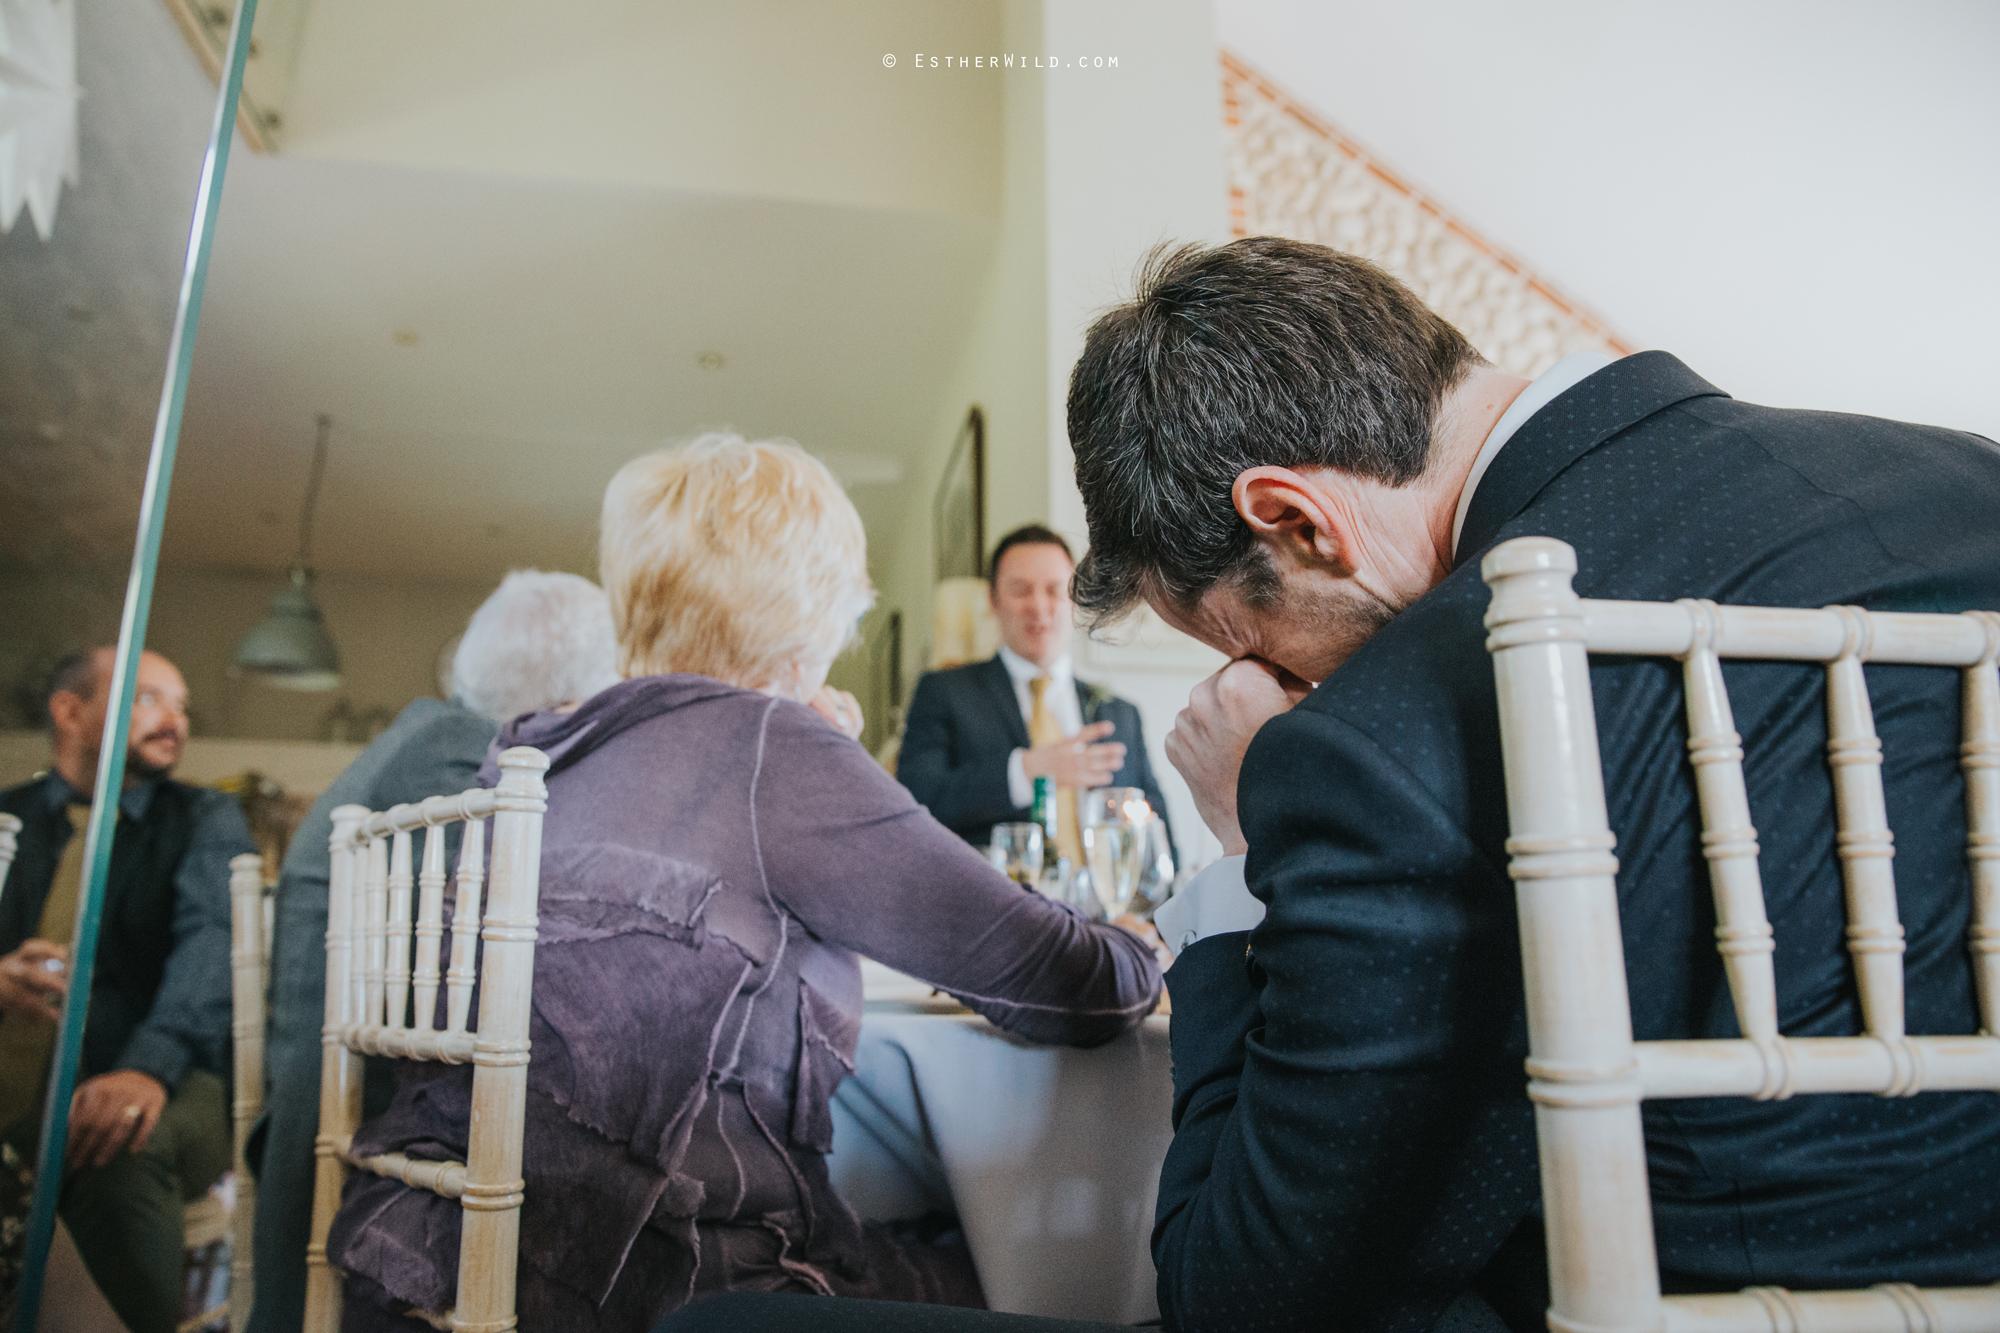 IMG_2017Cley_Barn_Drift_Norfolk_Coast_Wedding_Copyright_Esther_Wild_Photographer_.jpg